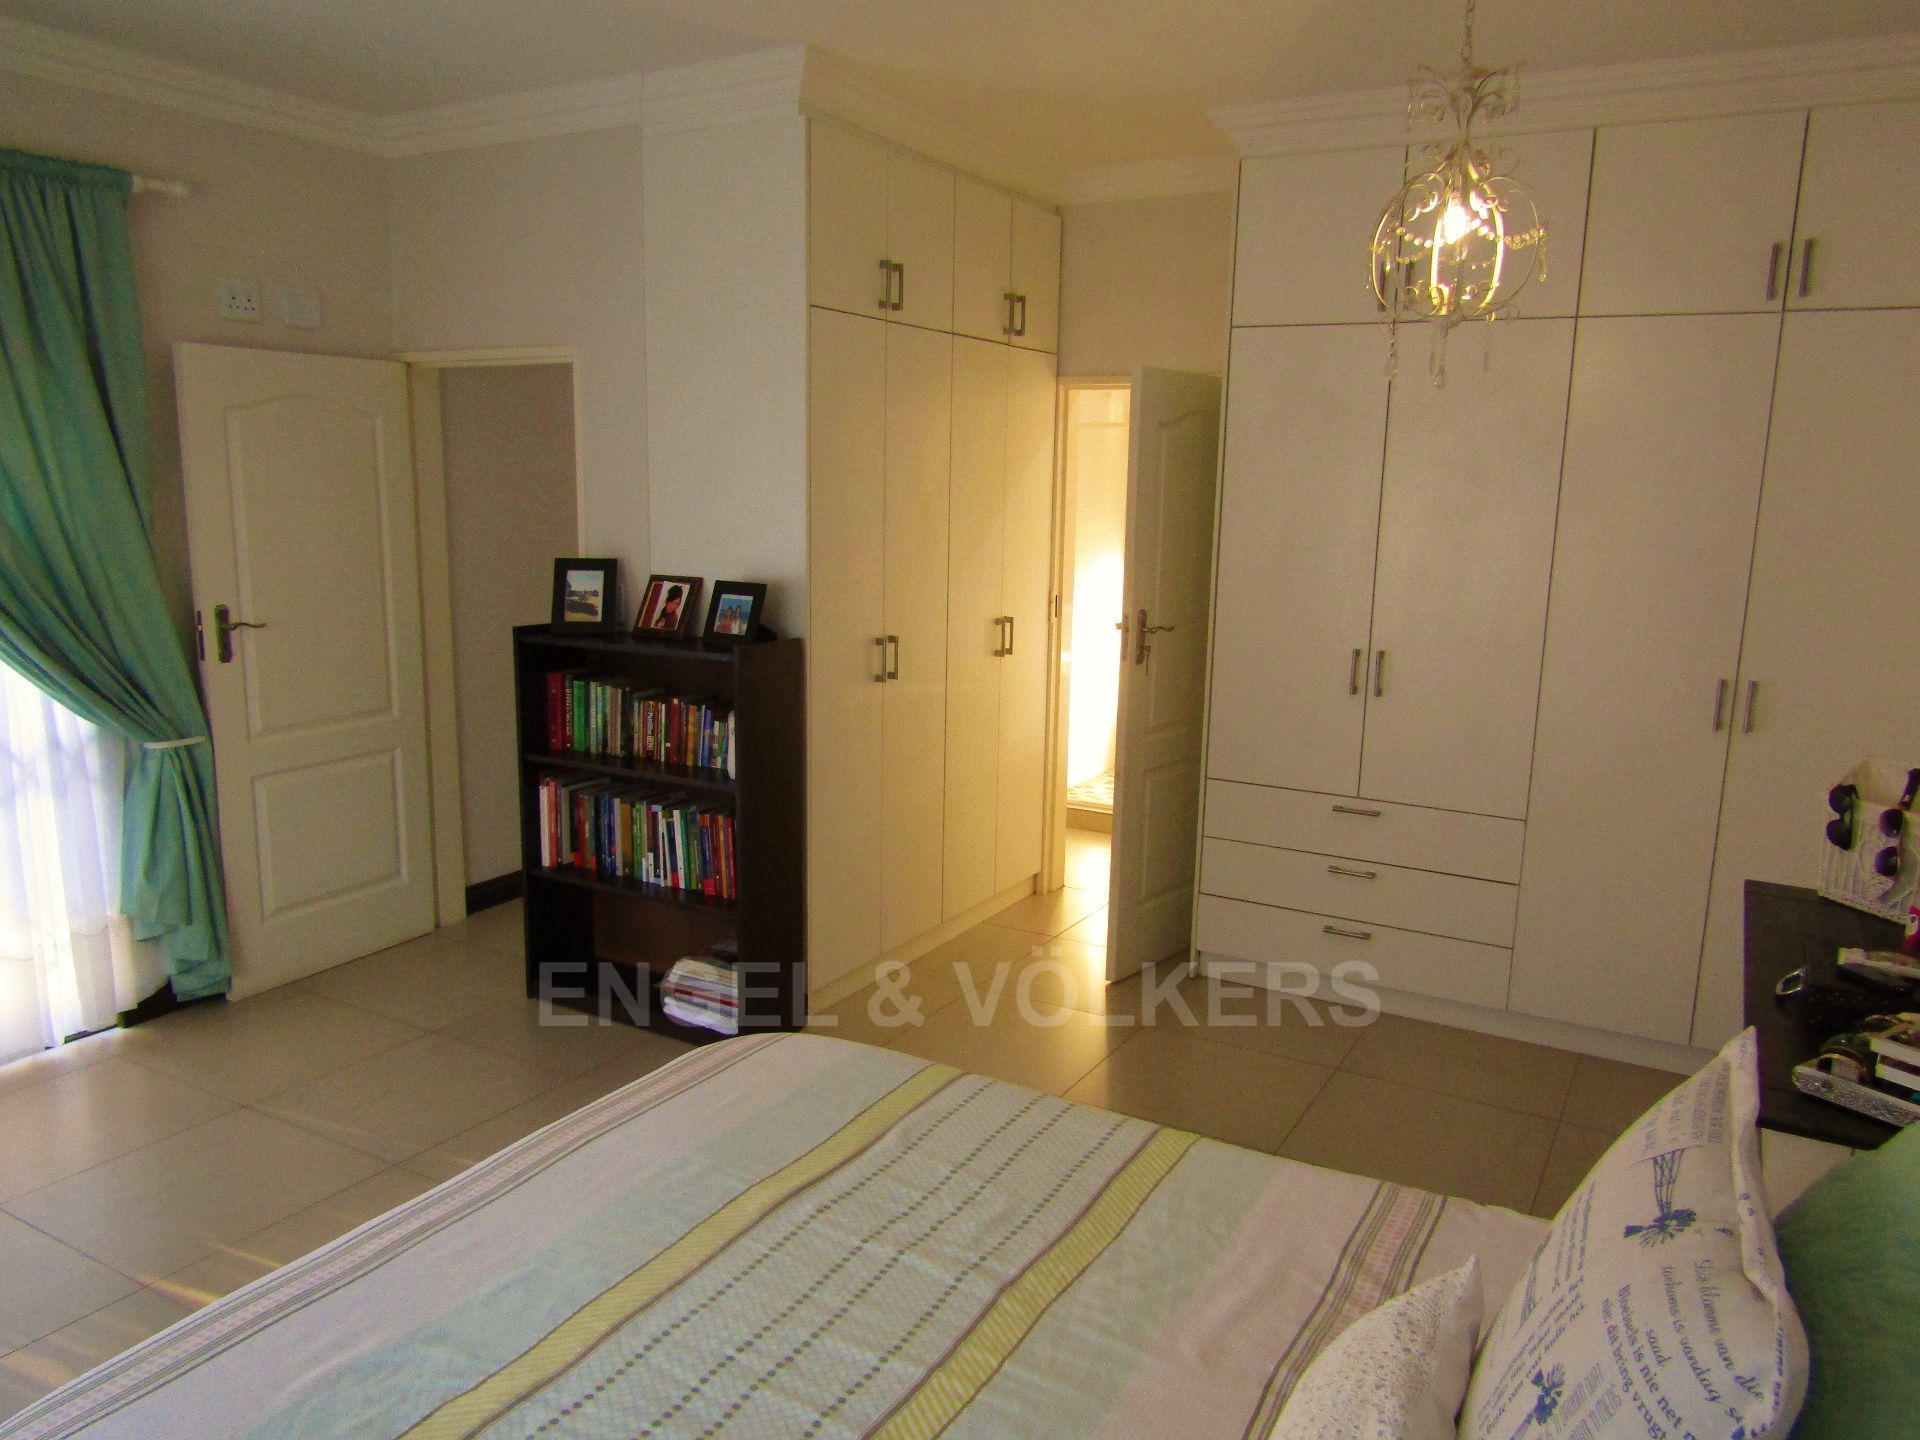 Lifestyle Estate property for sale. Ref No: 13458759. Picture no 20